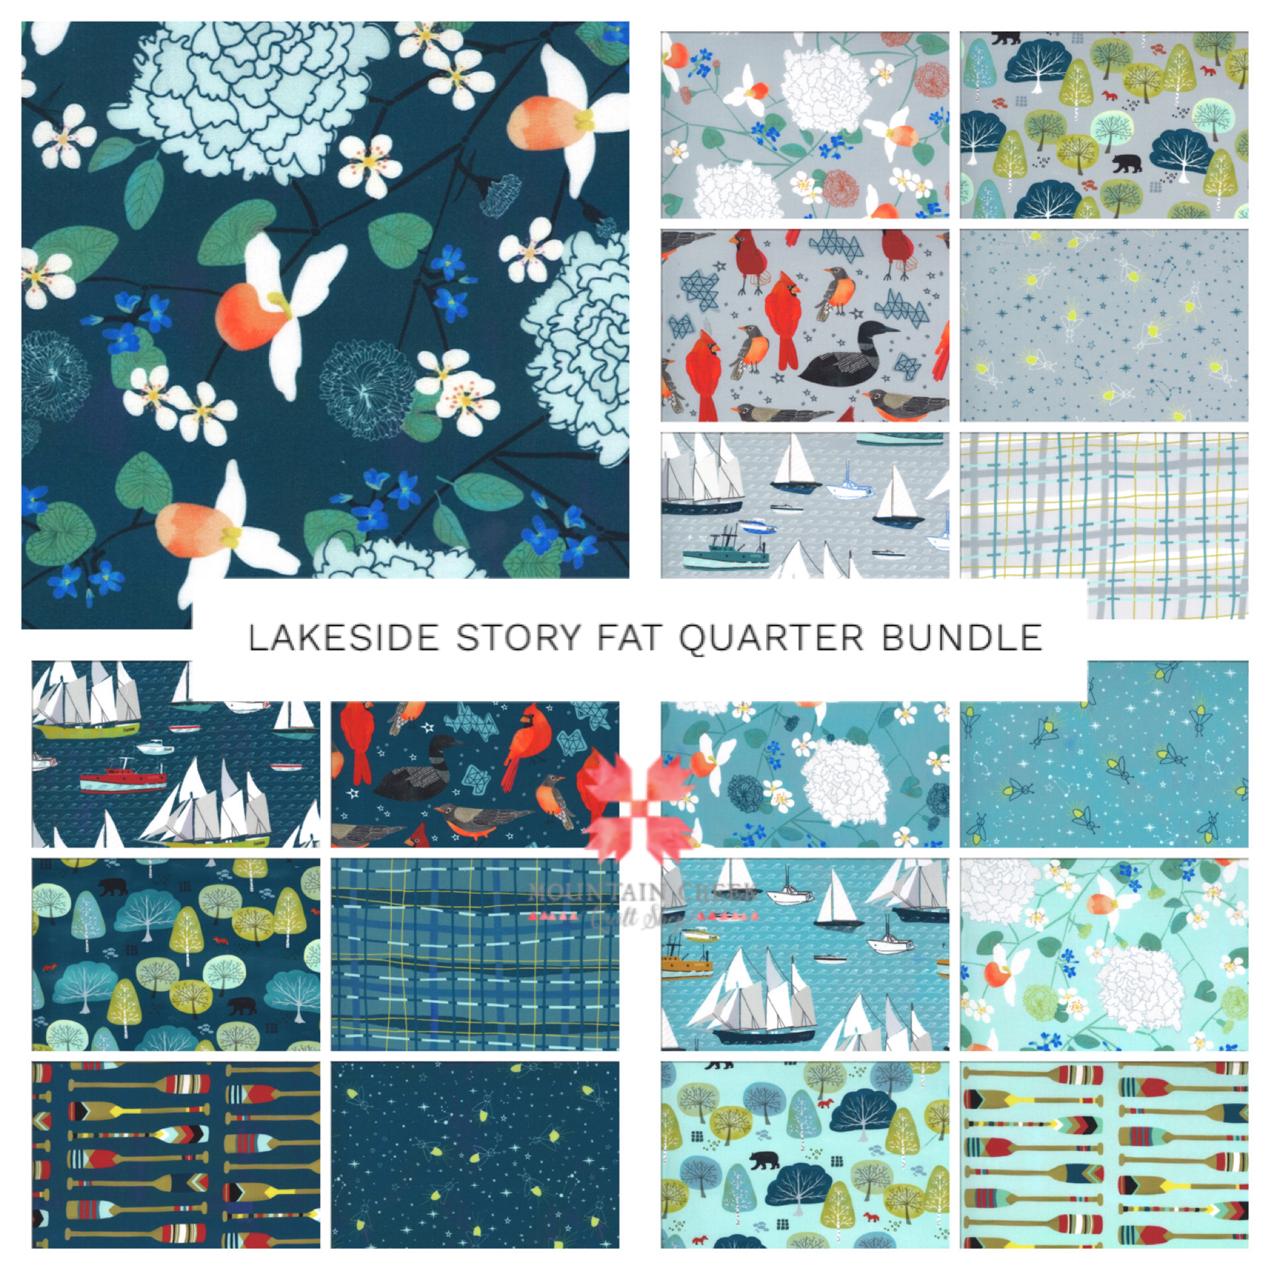 Lakeside Story Fat Quarter Bundle